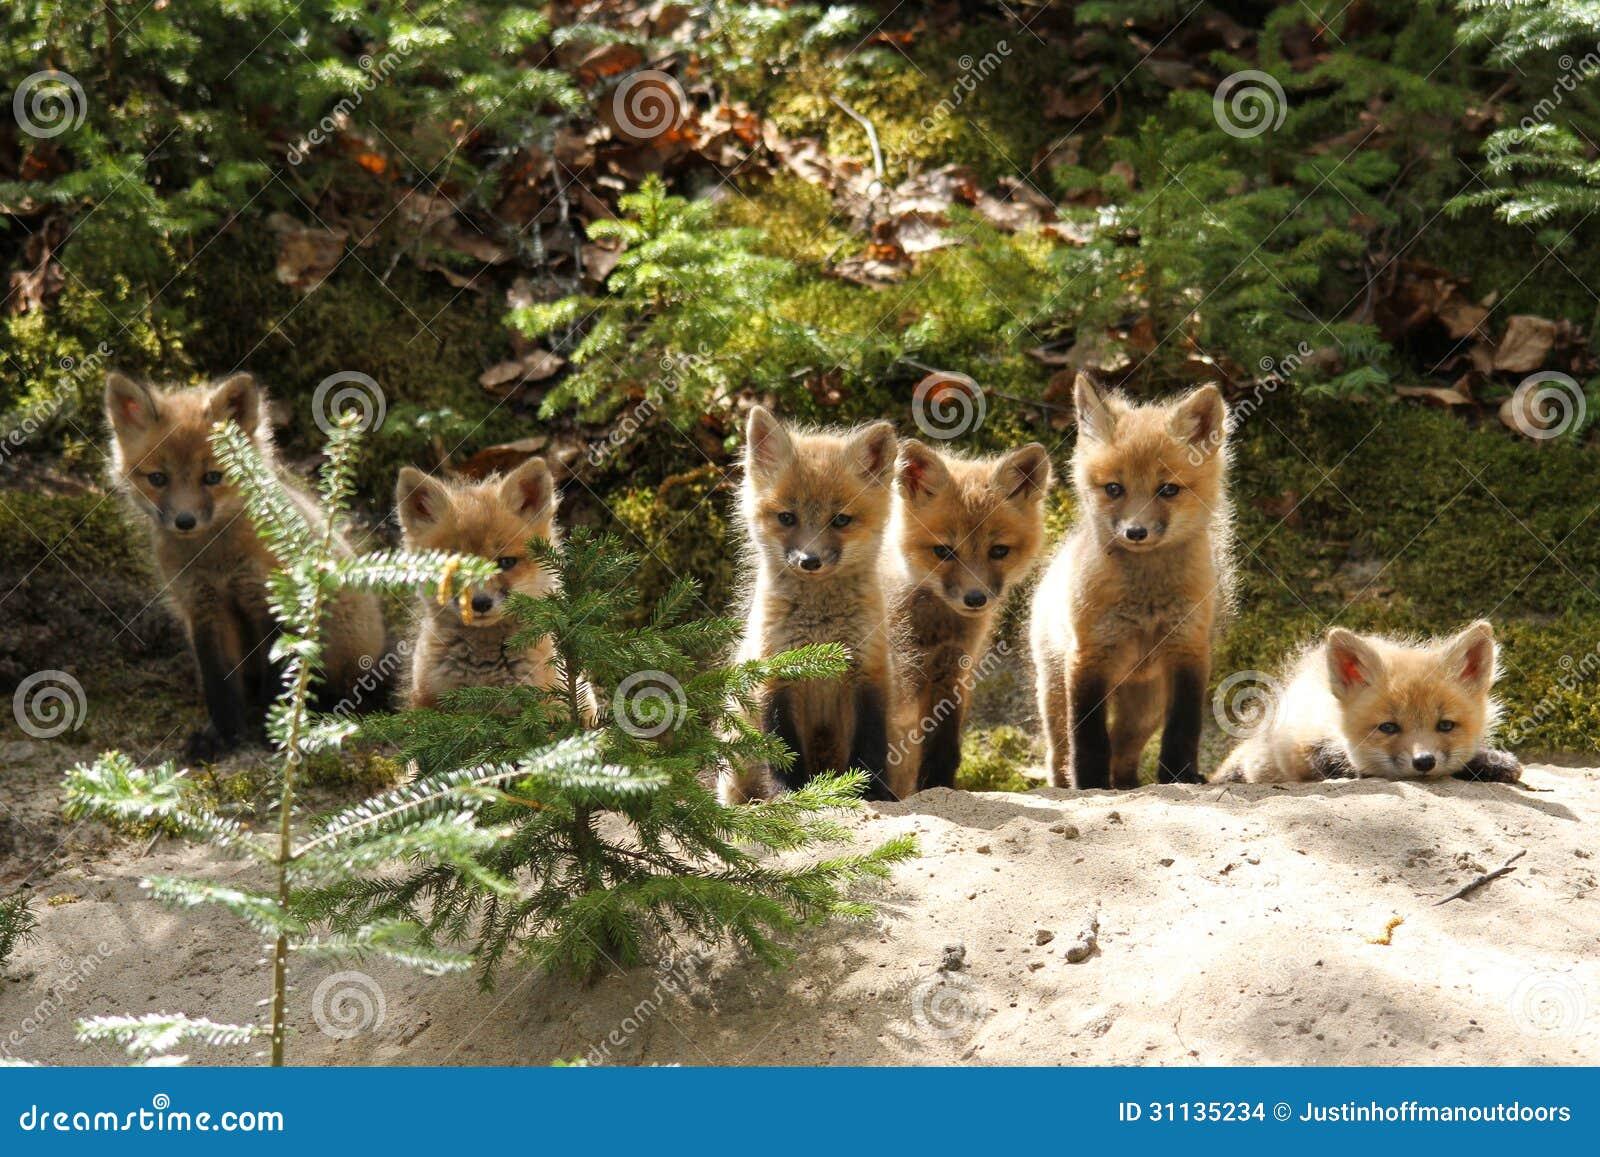 Red Fox Baby Kits